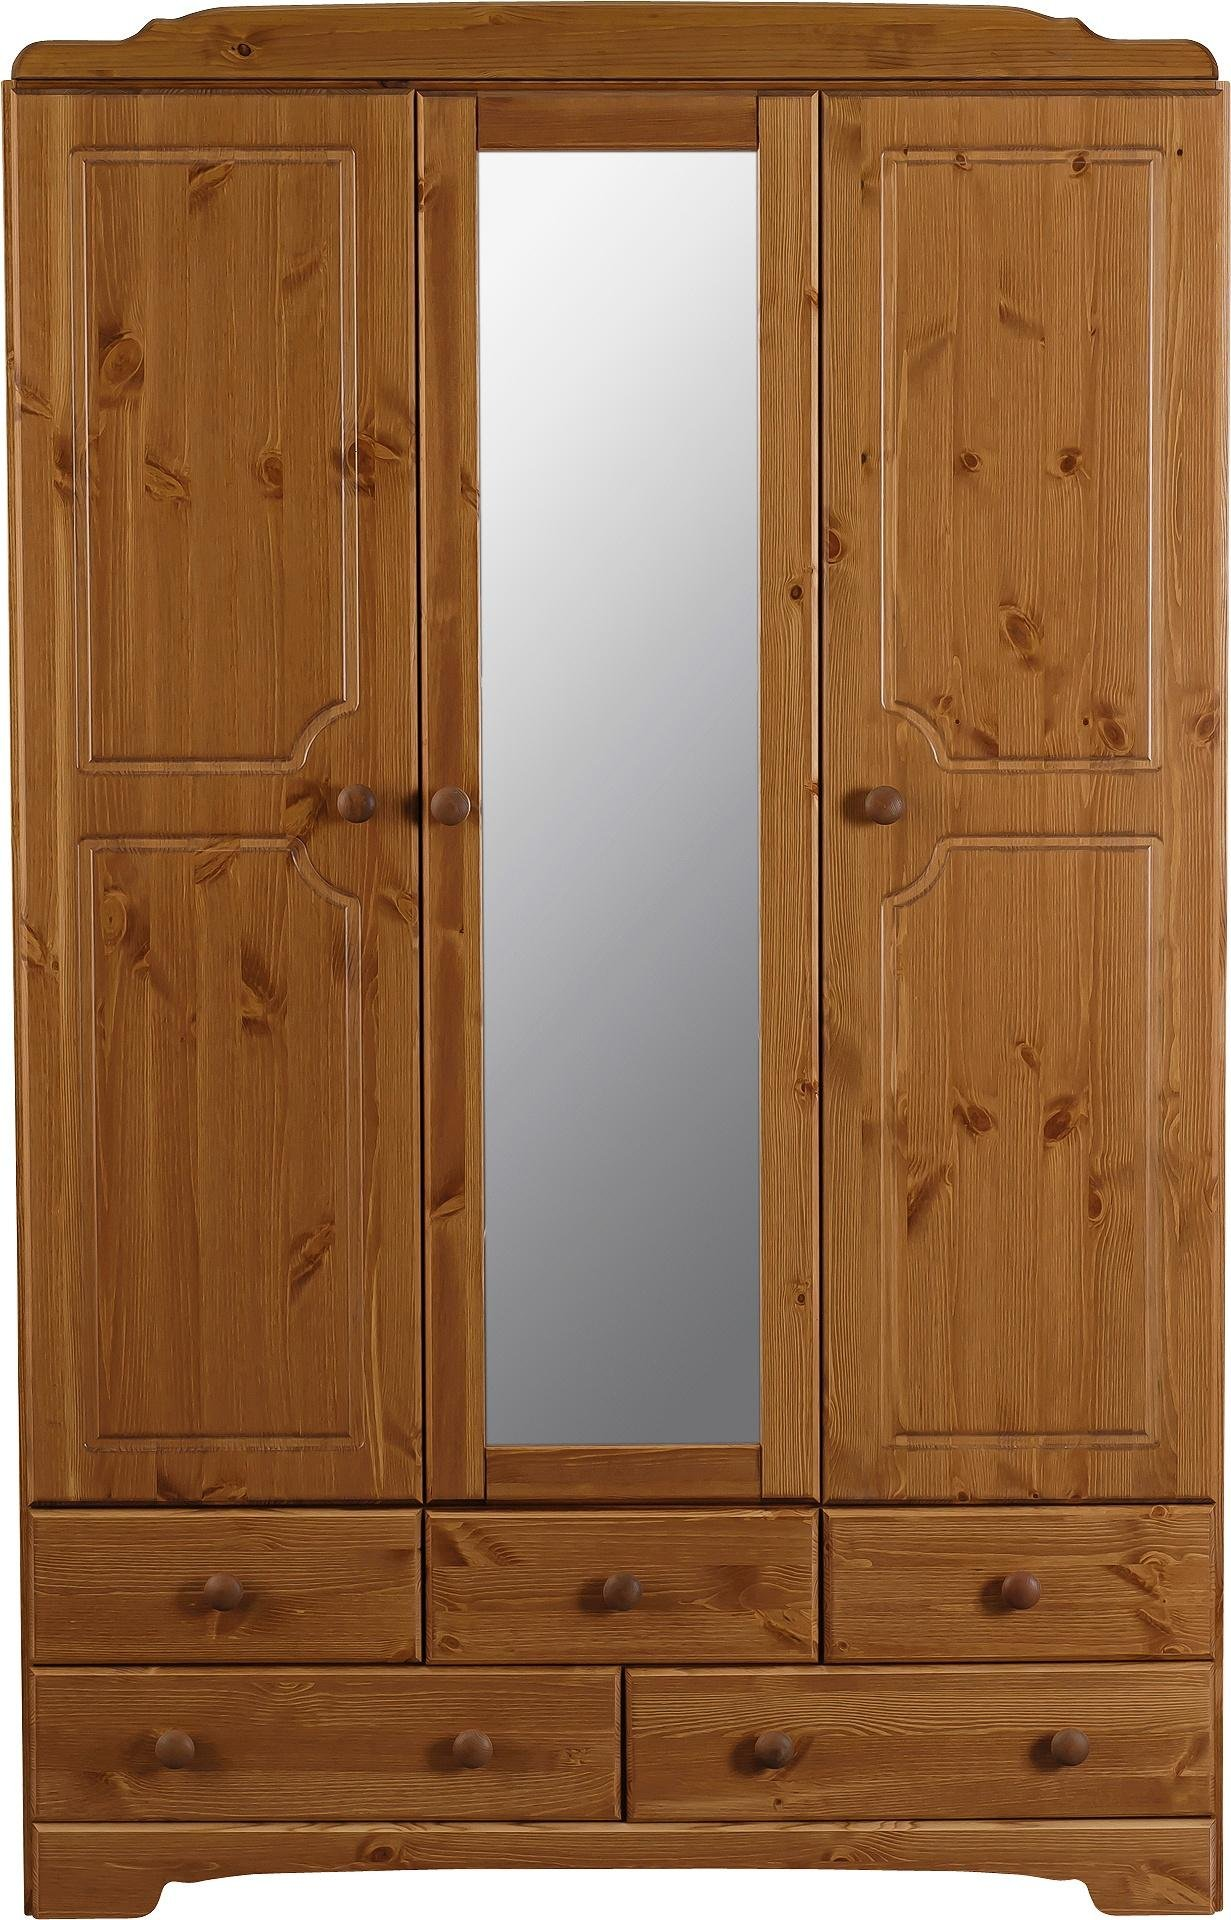 Argos Home Nordic 3 Door 5 Drawer Mirrored Wardrobe - Pine